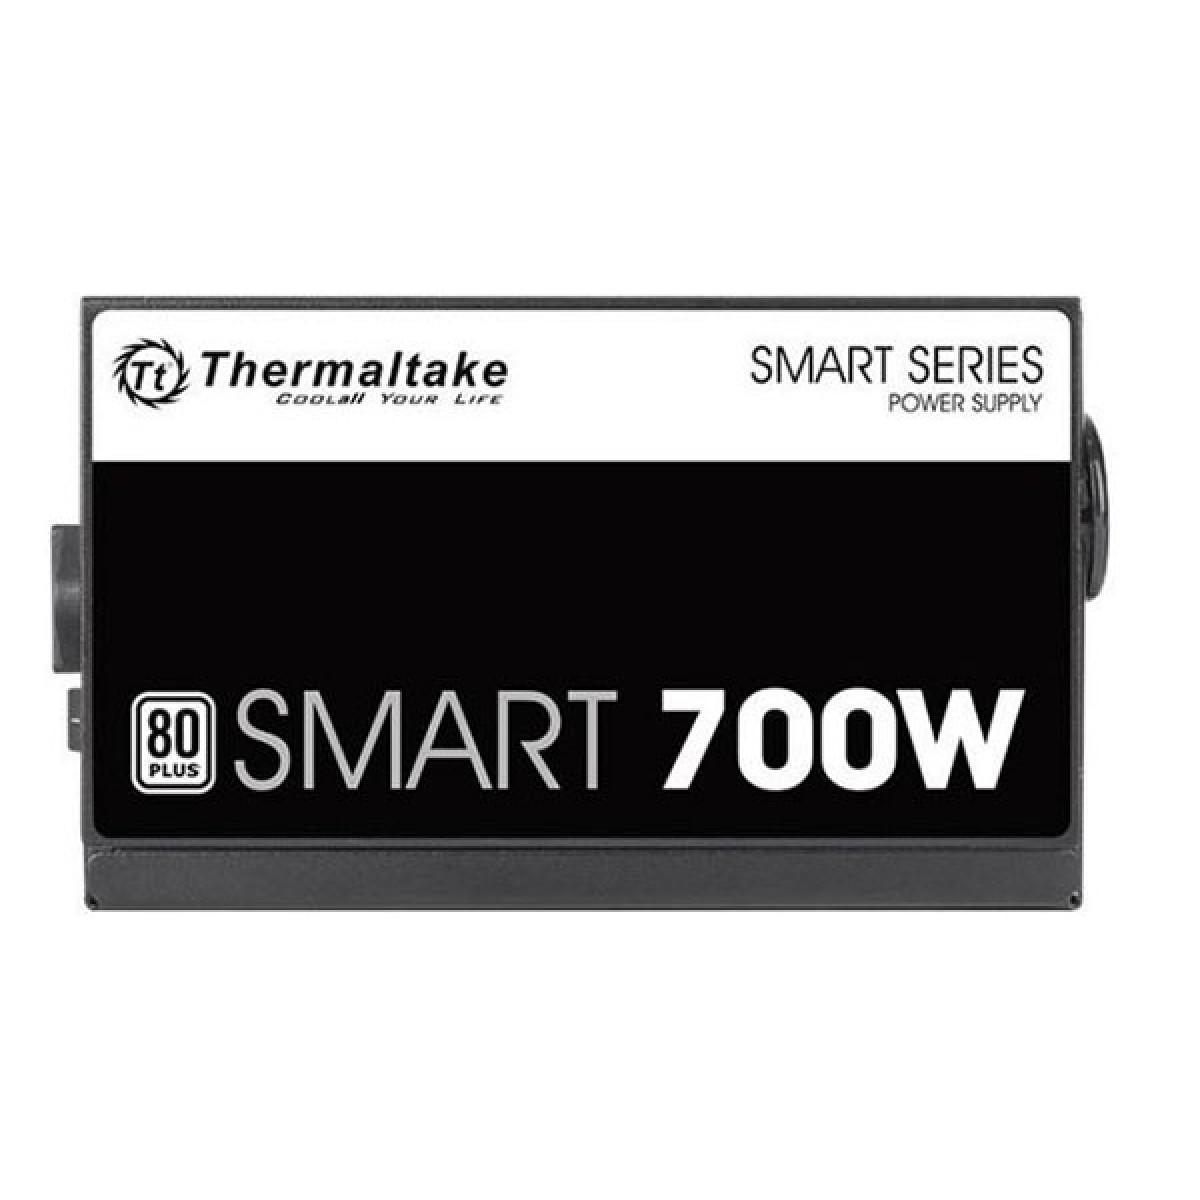 FONTE ATX 700W SMART 80 PLUS SPD-0700P THERMALTAKE